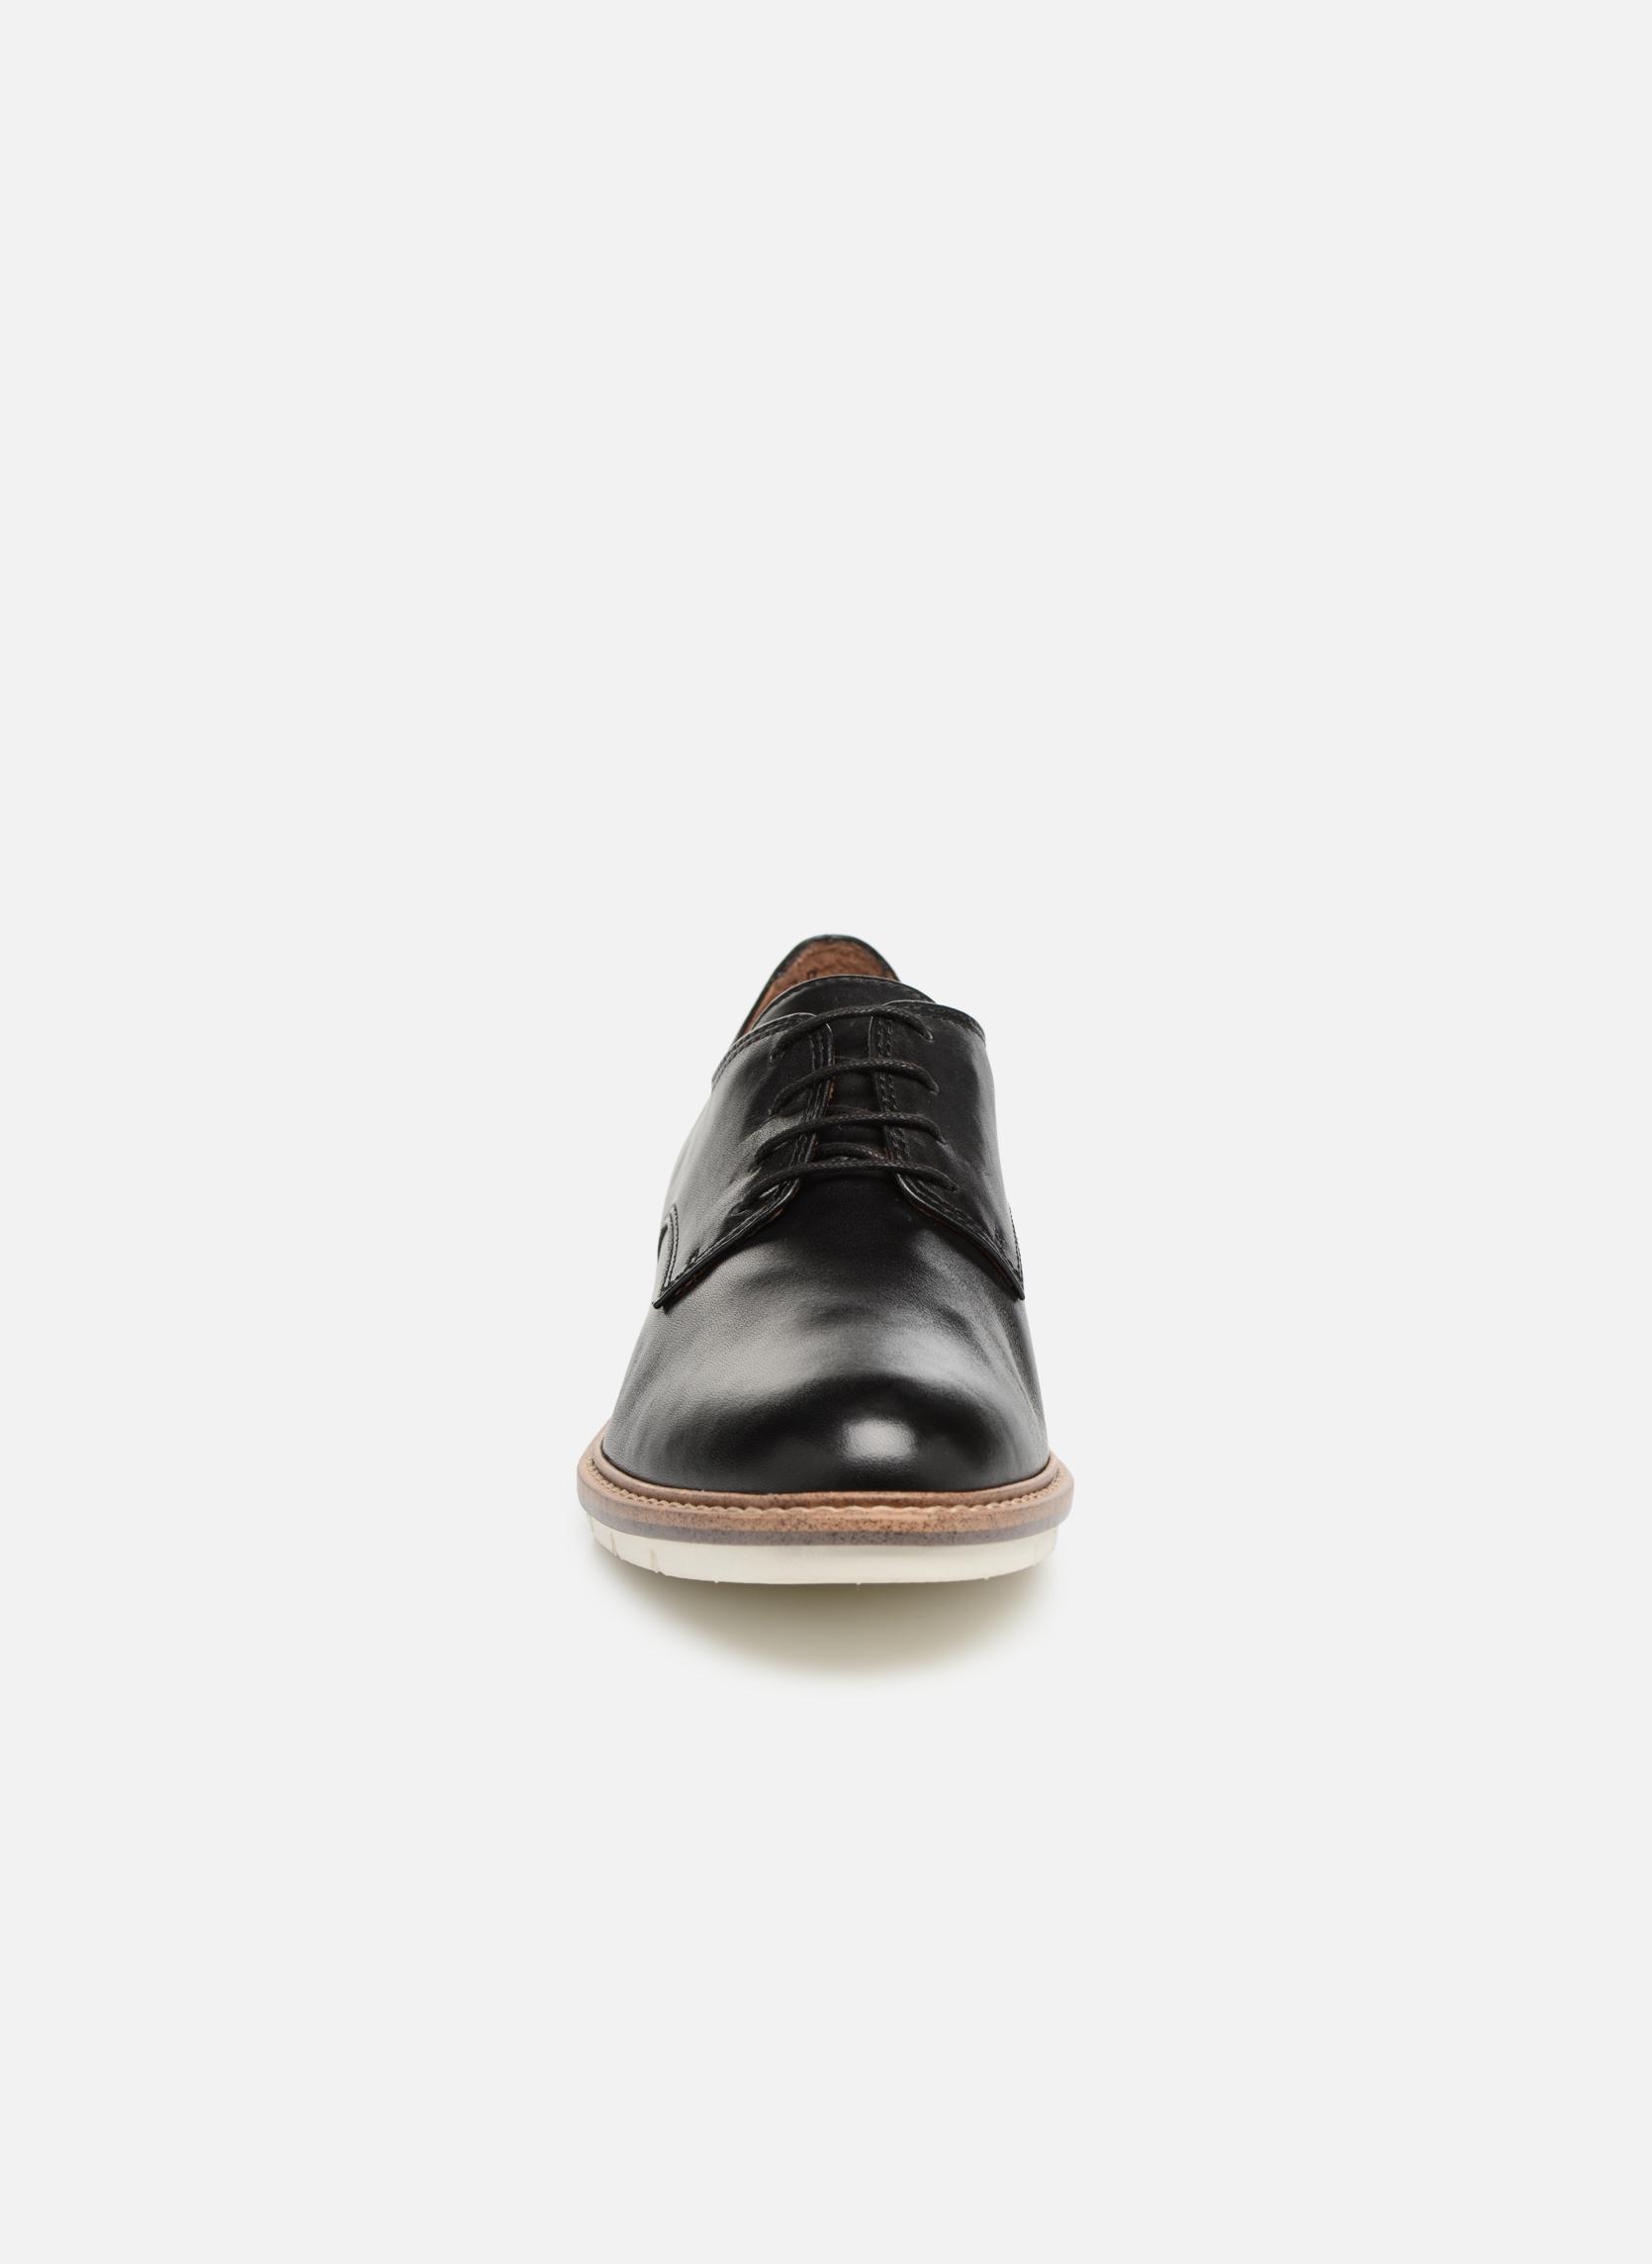 Absinthe Black leather